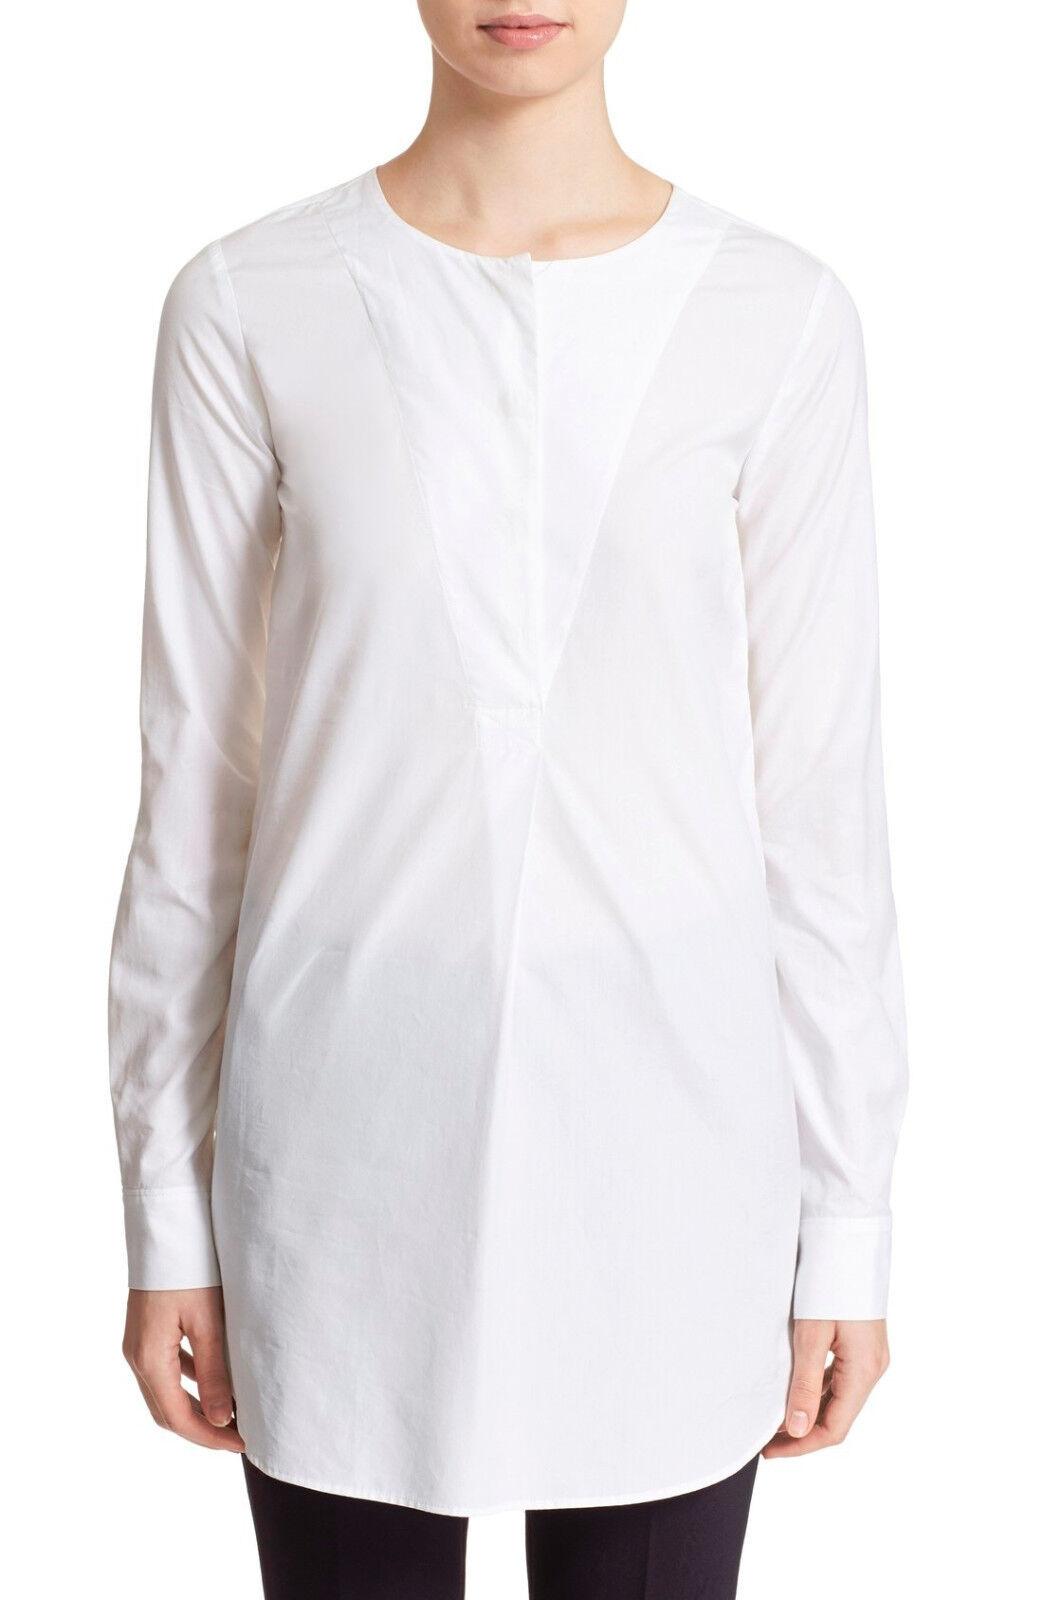 Woherren Theory Weiß TILLFIN SARTORIAL Button Popover Shirt Top, Sz S